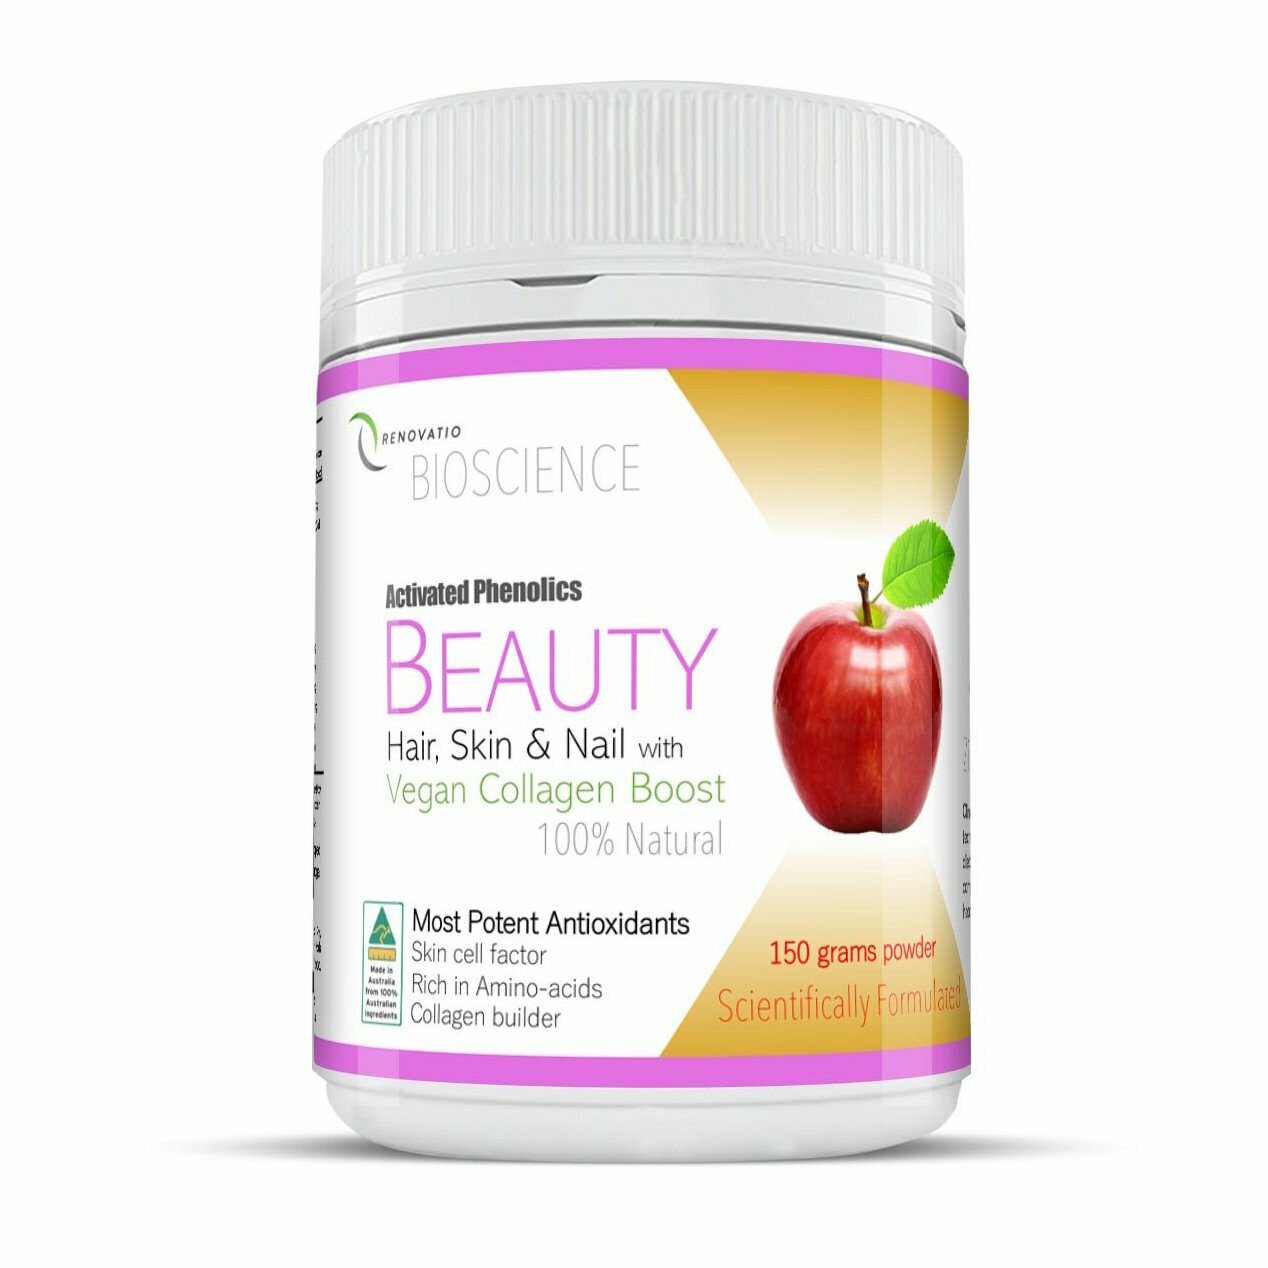 Renovatio Beauty Powder